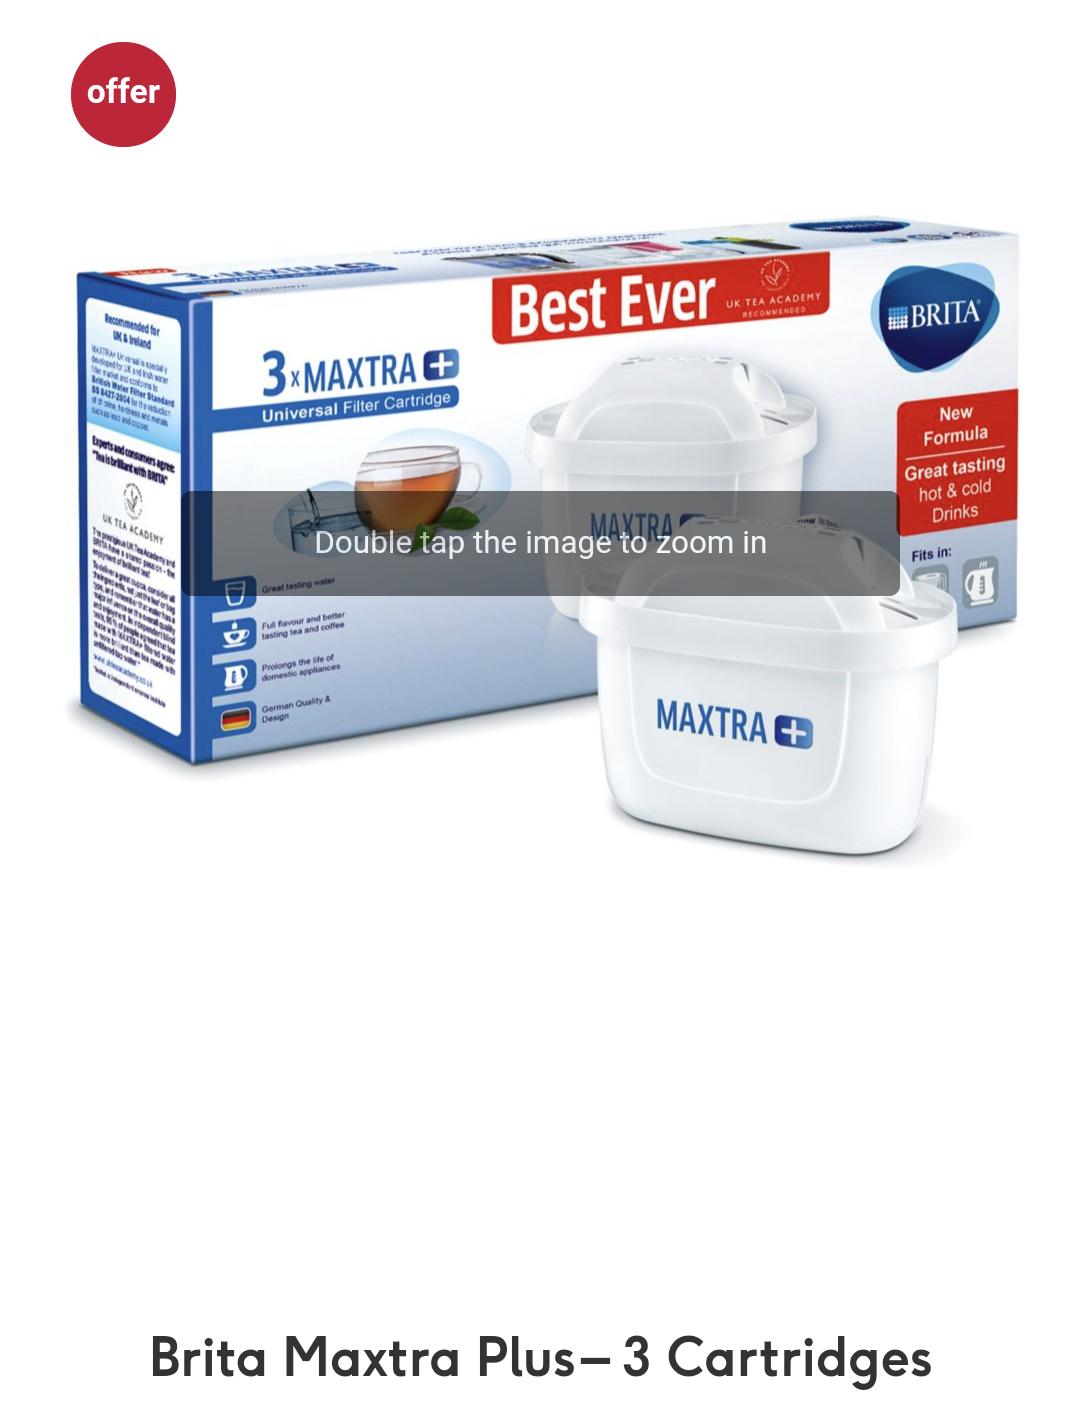 Brita MAXTRA filter x 3 £11.15 @ Boots + £1.50 click and collect